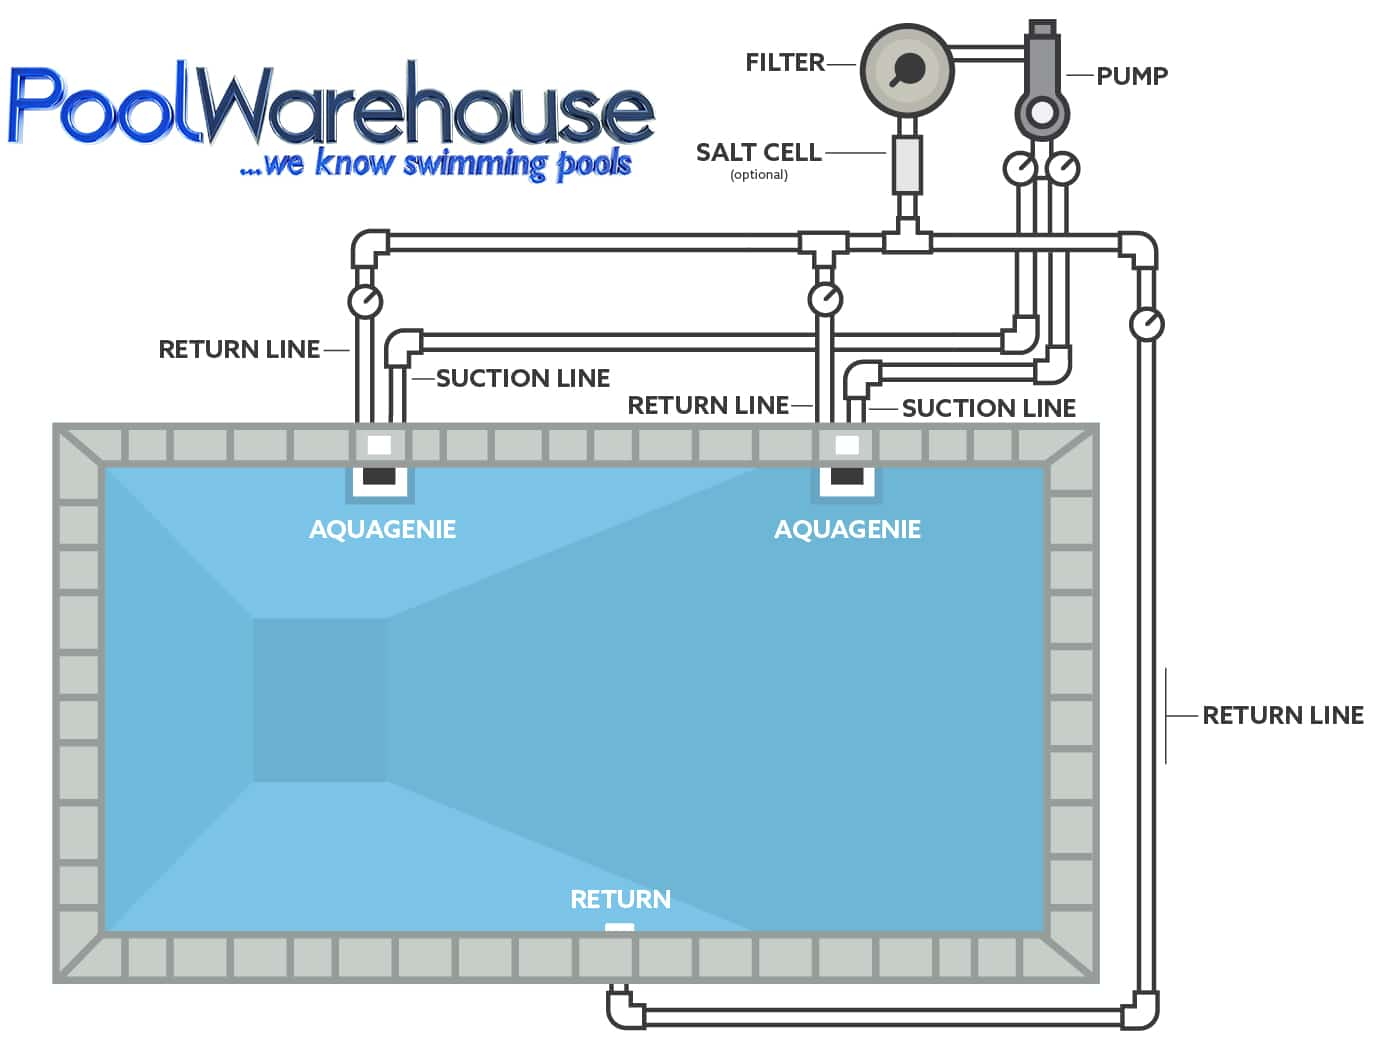 hight resolution of piping diagram for inground pool wiring diagram toolboxhayward pool piping diagram wiring diagram yer piping diagram